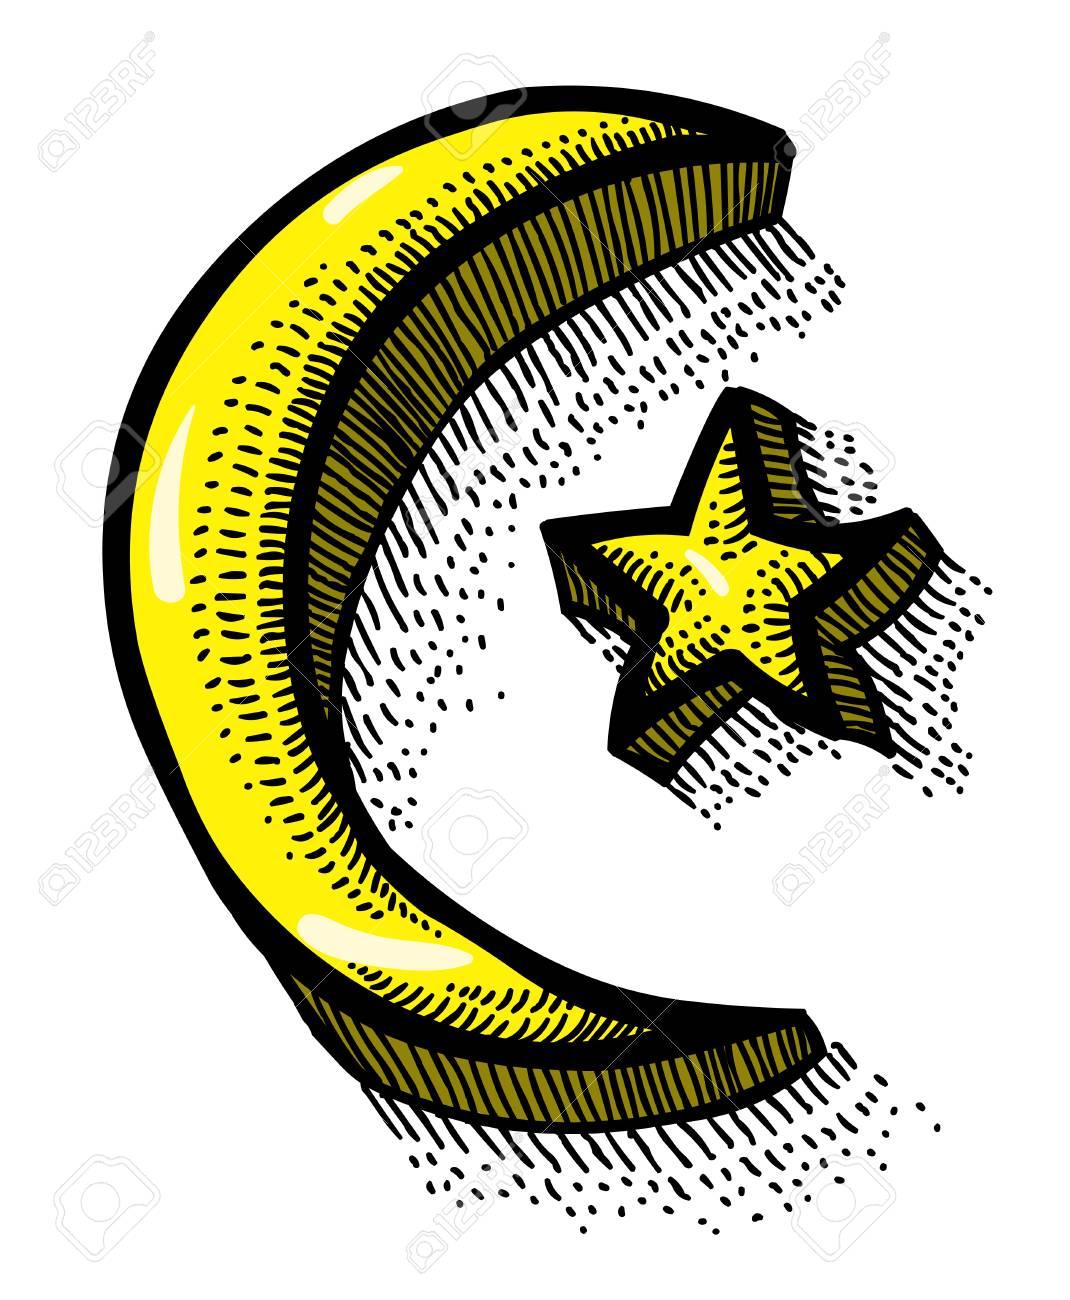 Cartoon Image Of Islam Symbol Royalty Free Cliparts Vectors And